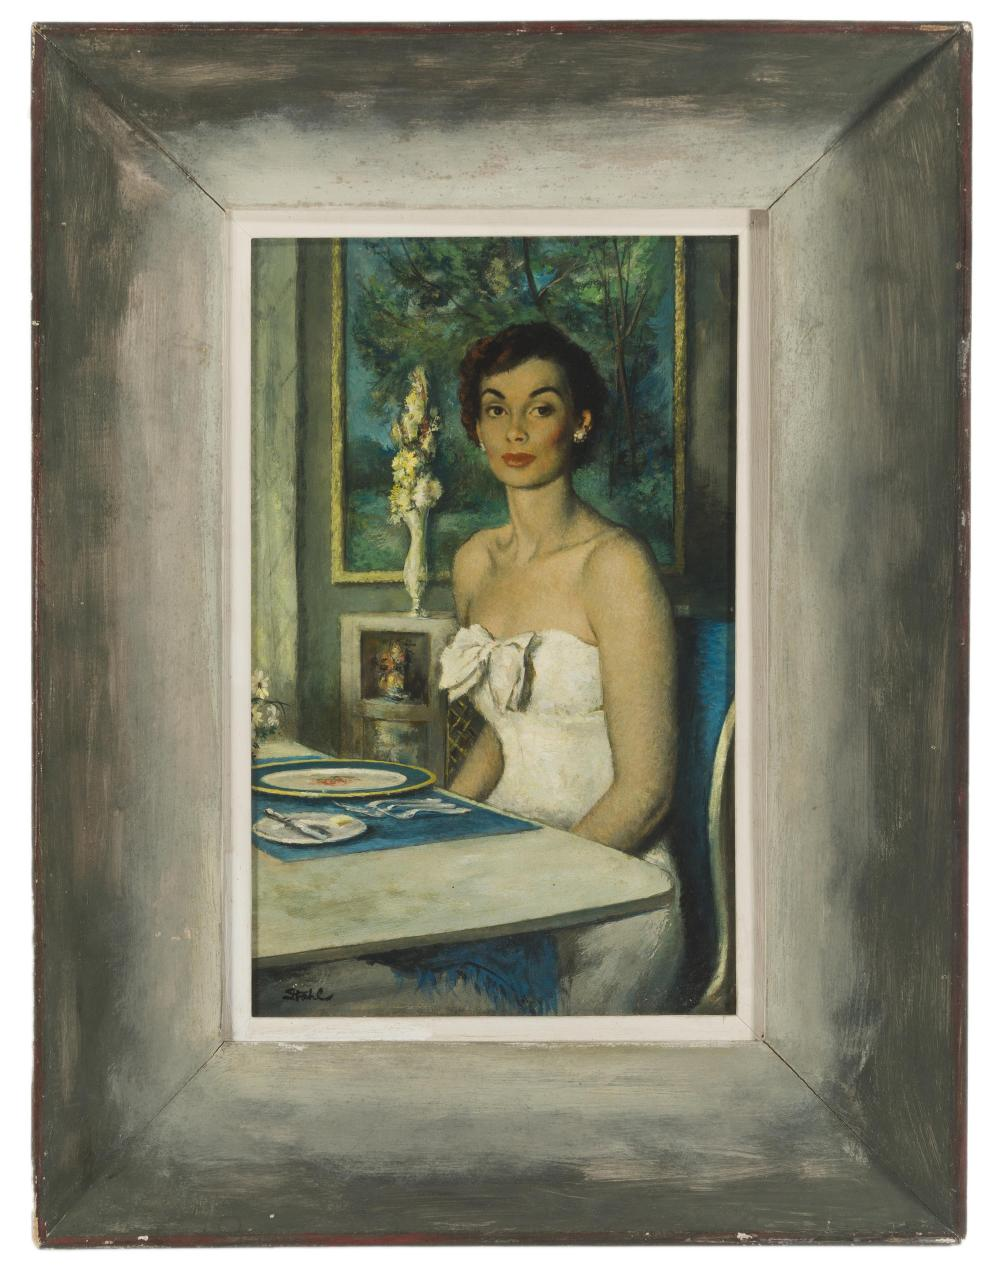 Benjamin Stahl, (1910-1987 Sarasota, FL), Young woman seated, Oil on board, 14.5